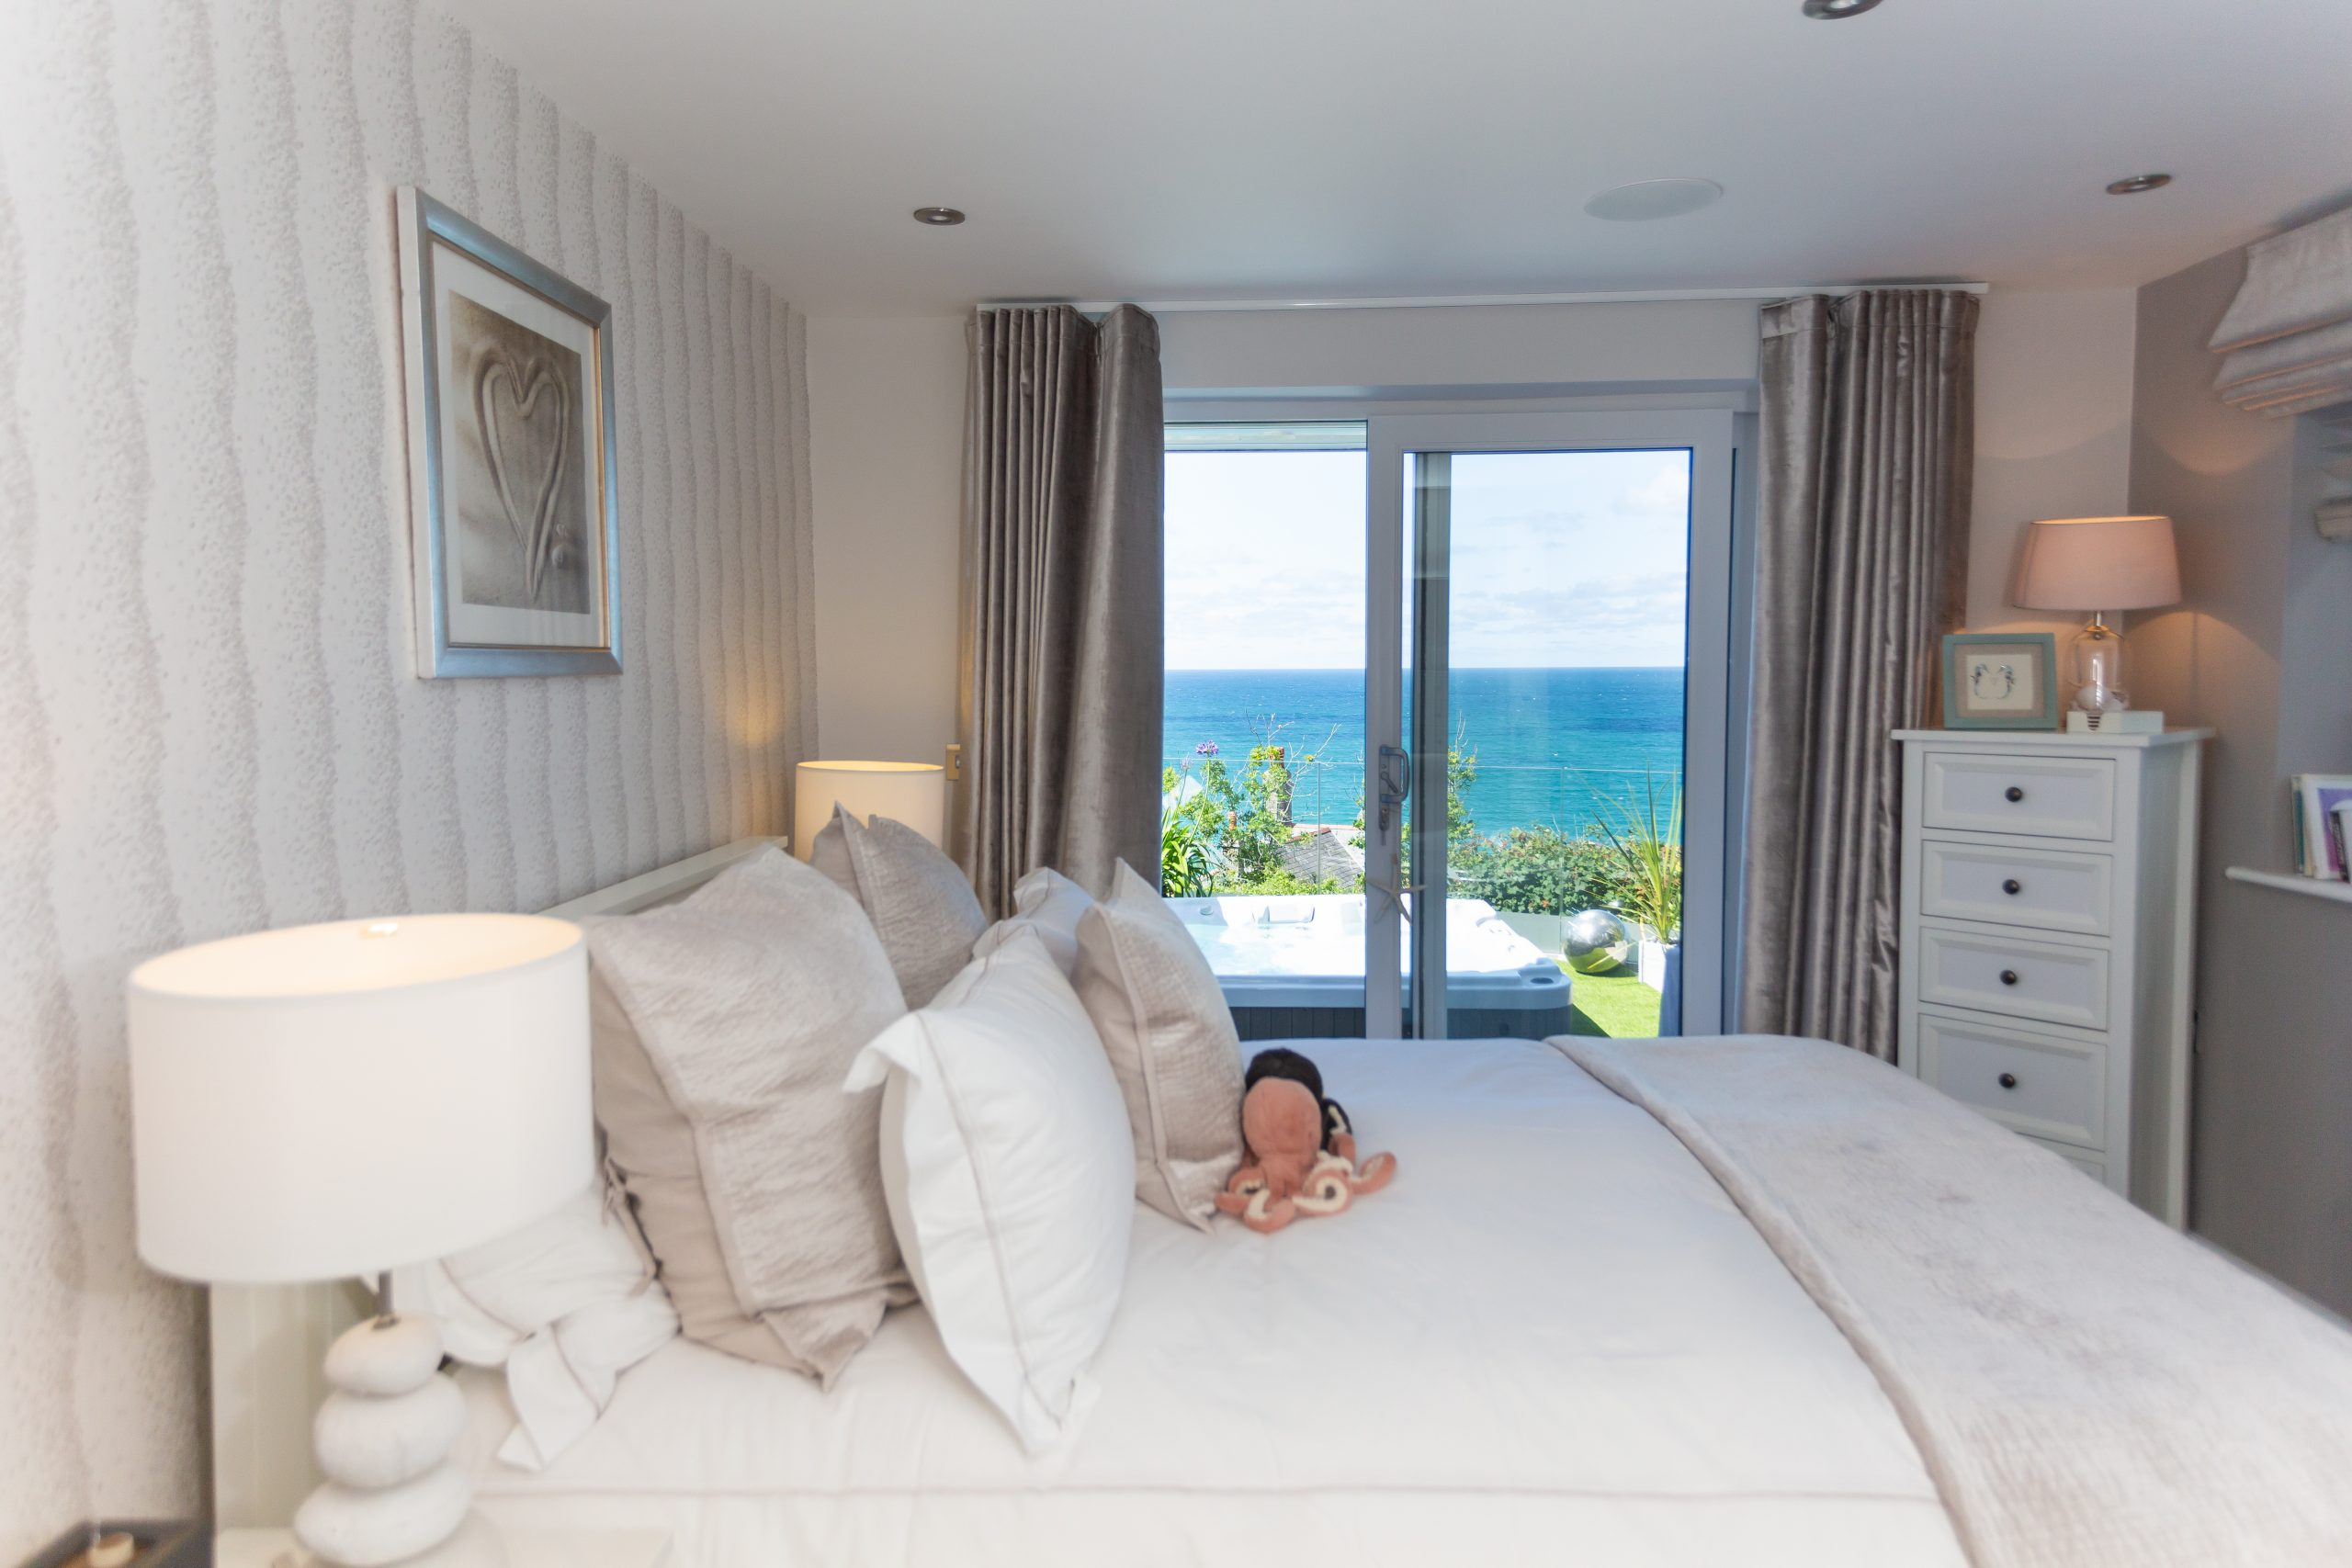 Bedroom at One Atlantic Watch